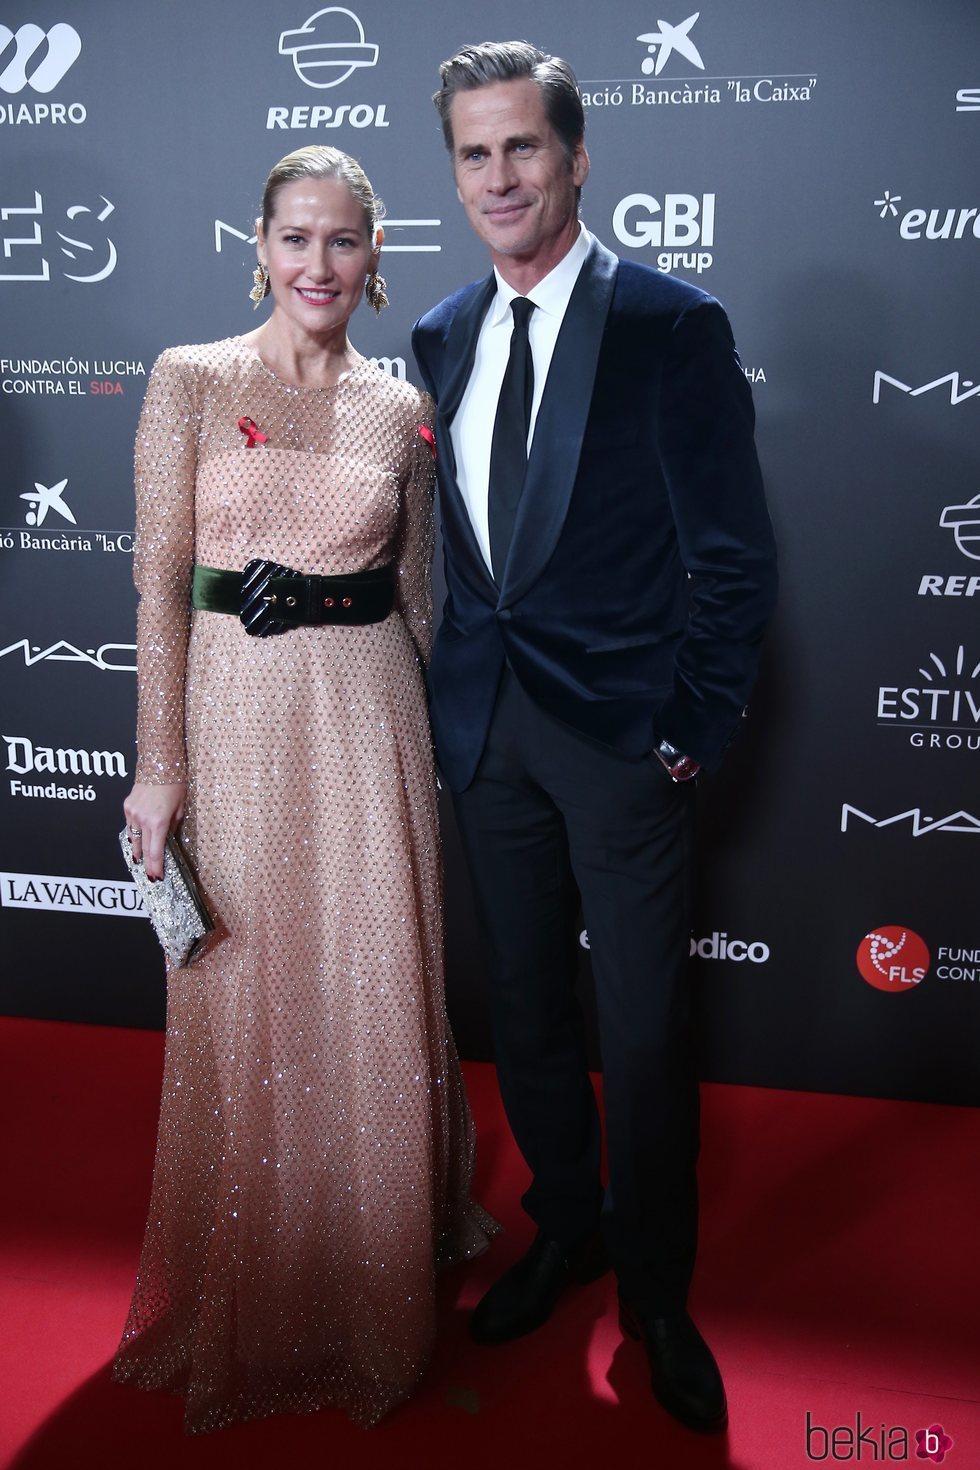 Fiona Ferrer y Marc Vanderloo en la gala 'People in red' 2018